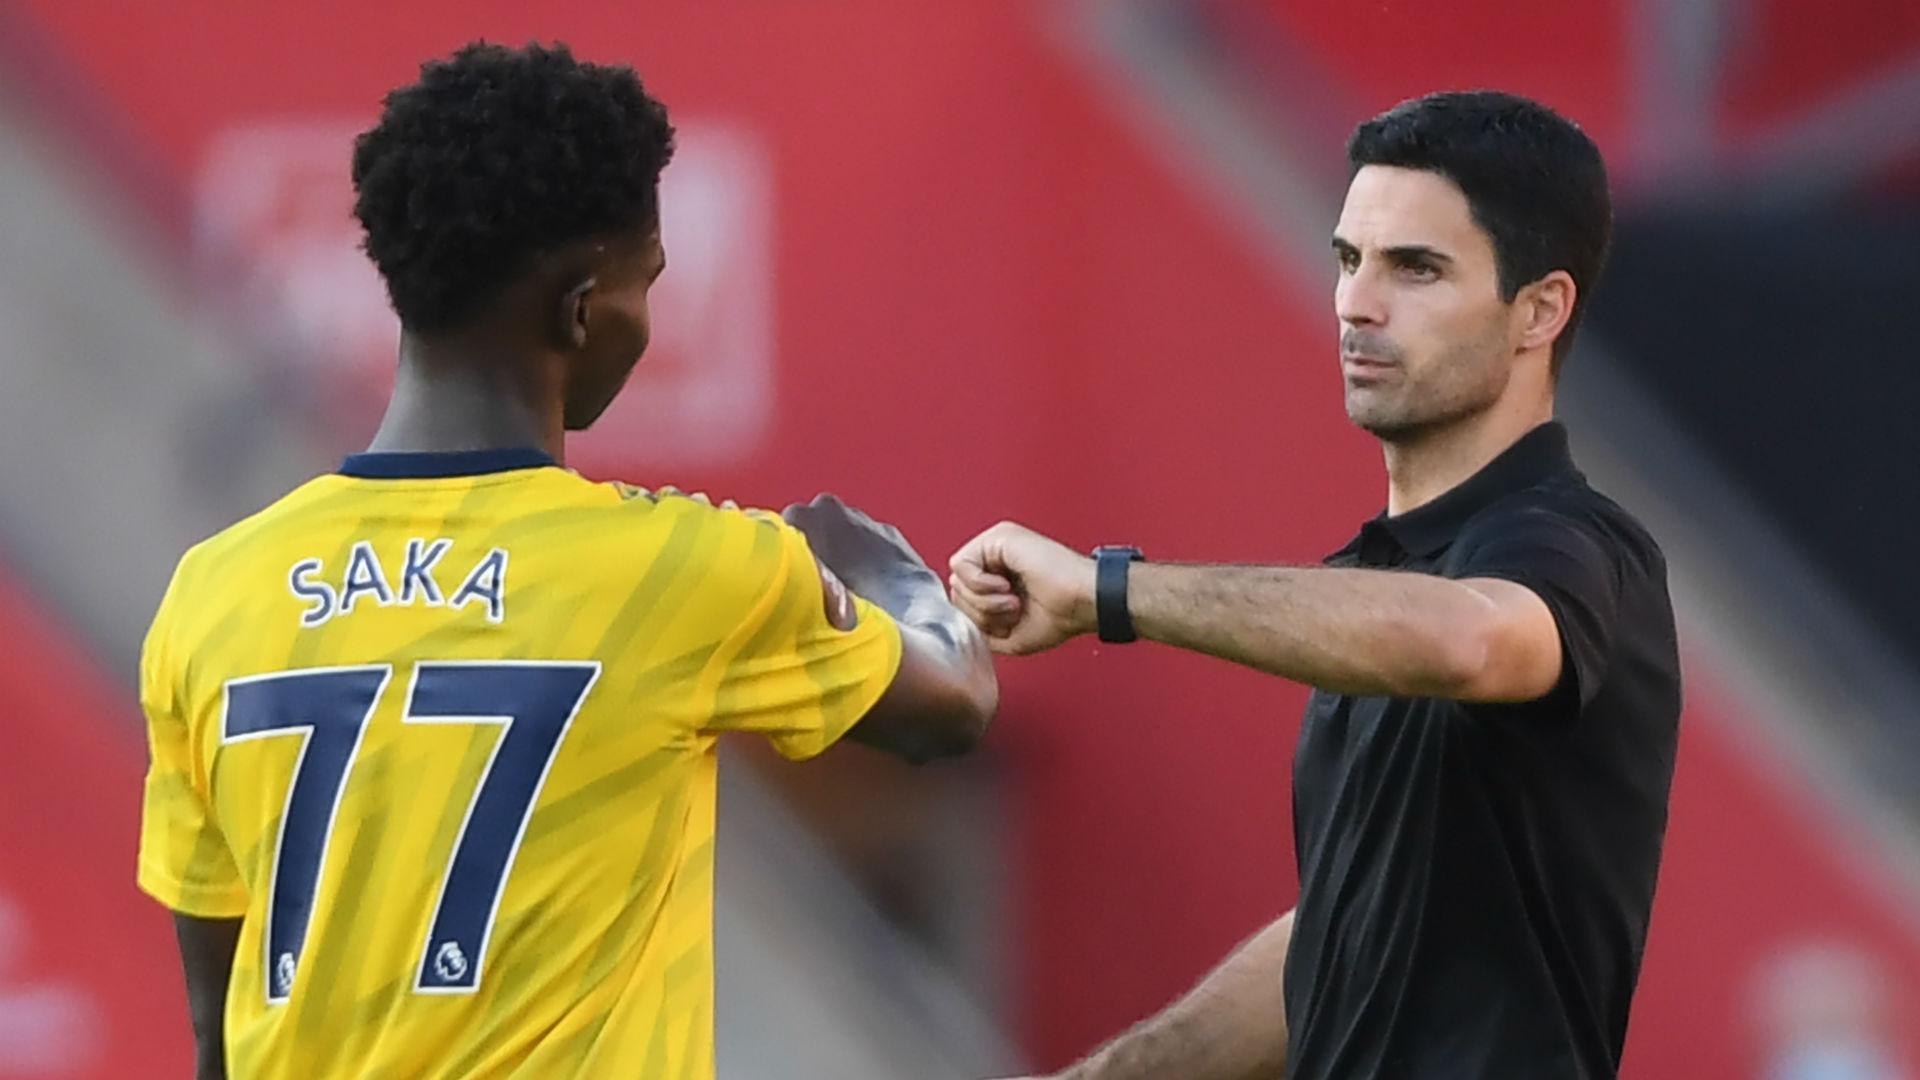 'Enjoy the moment' – Arteta advises Arsenal teen sensation Saka about hype